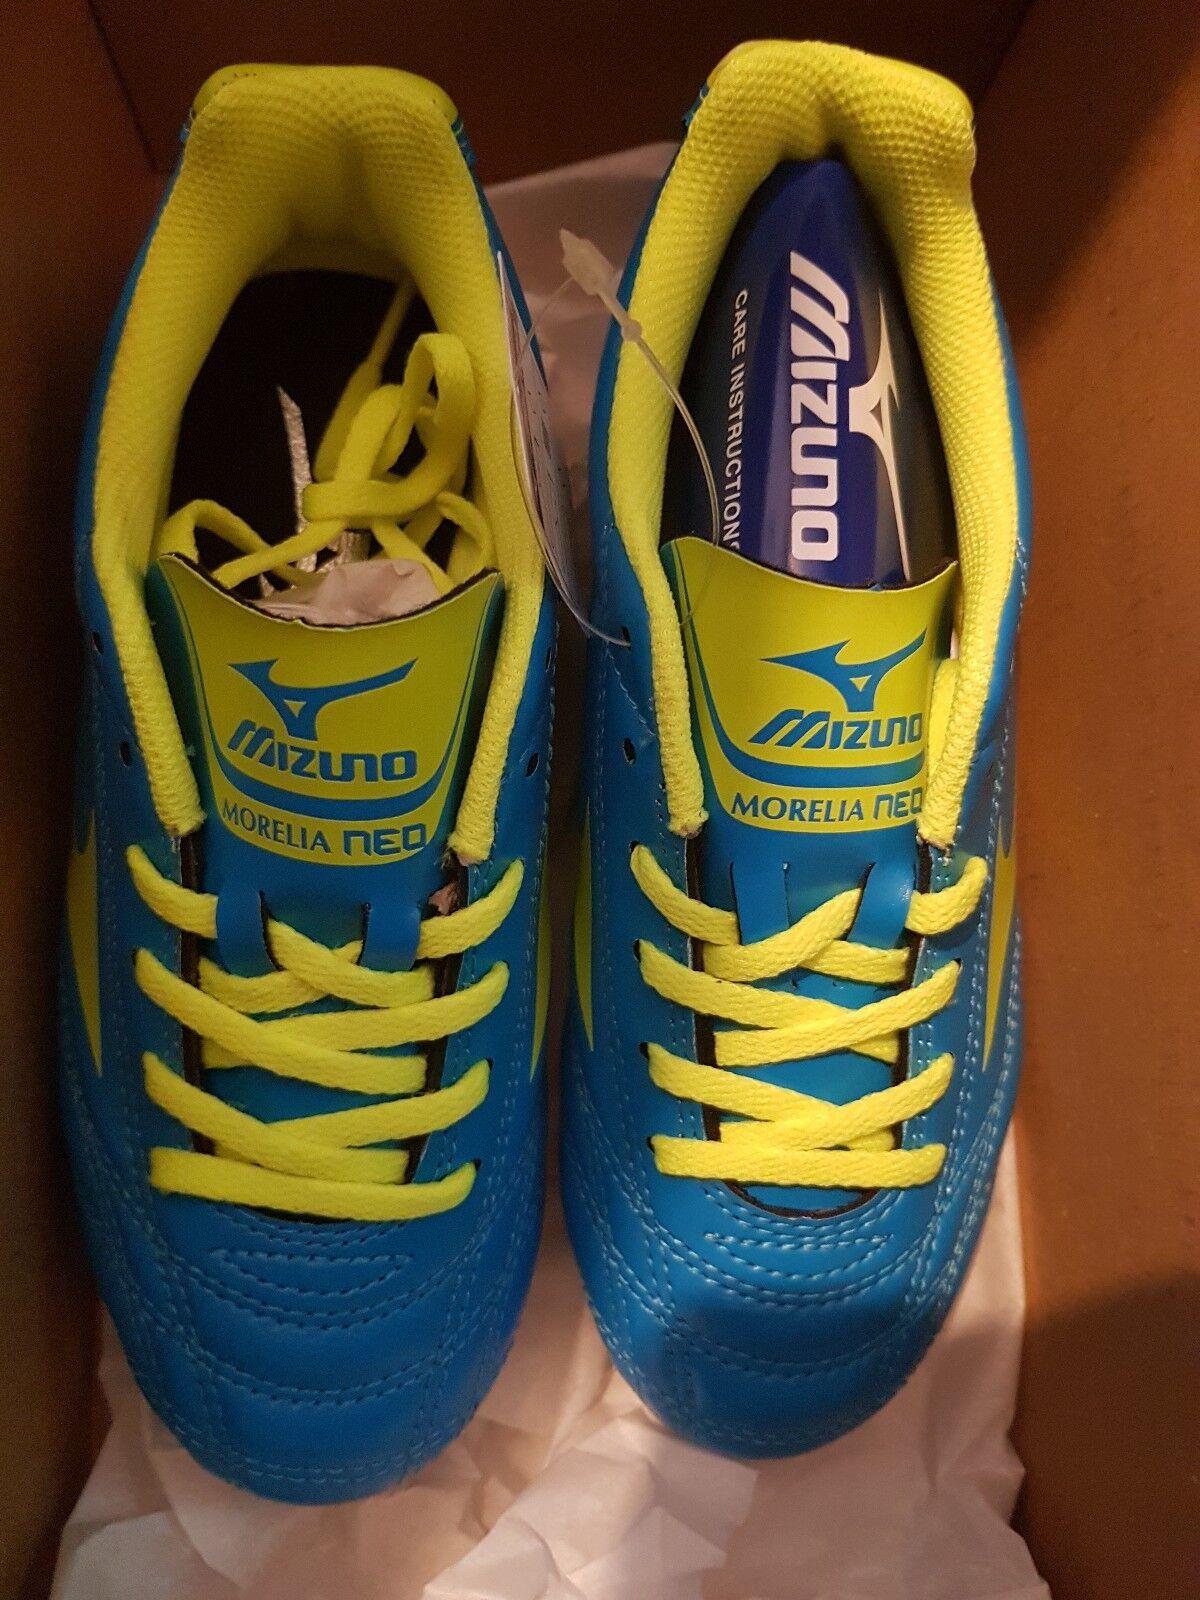 Mizuno Morelia Neo Jr.MD Fußball Stiefel UK Größe 1 EU32.5